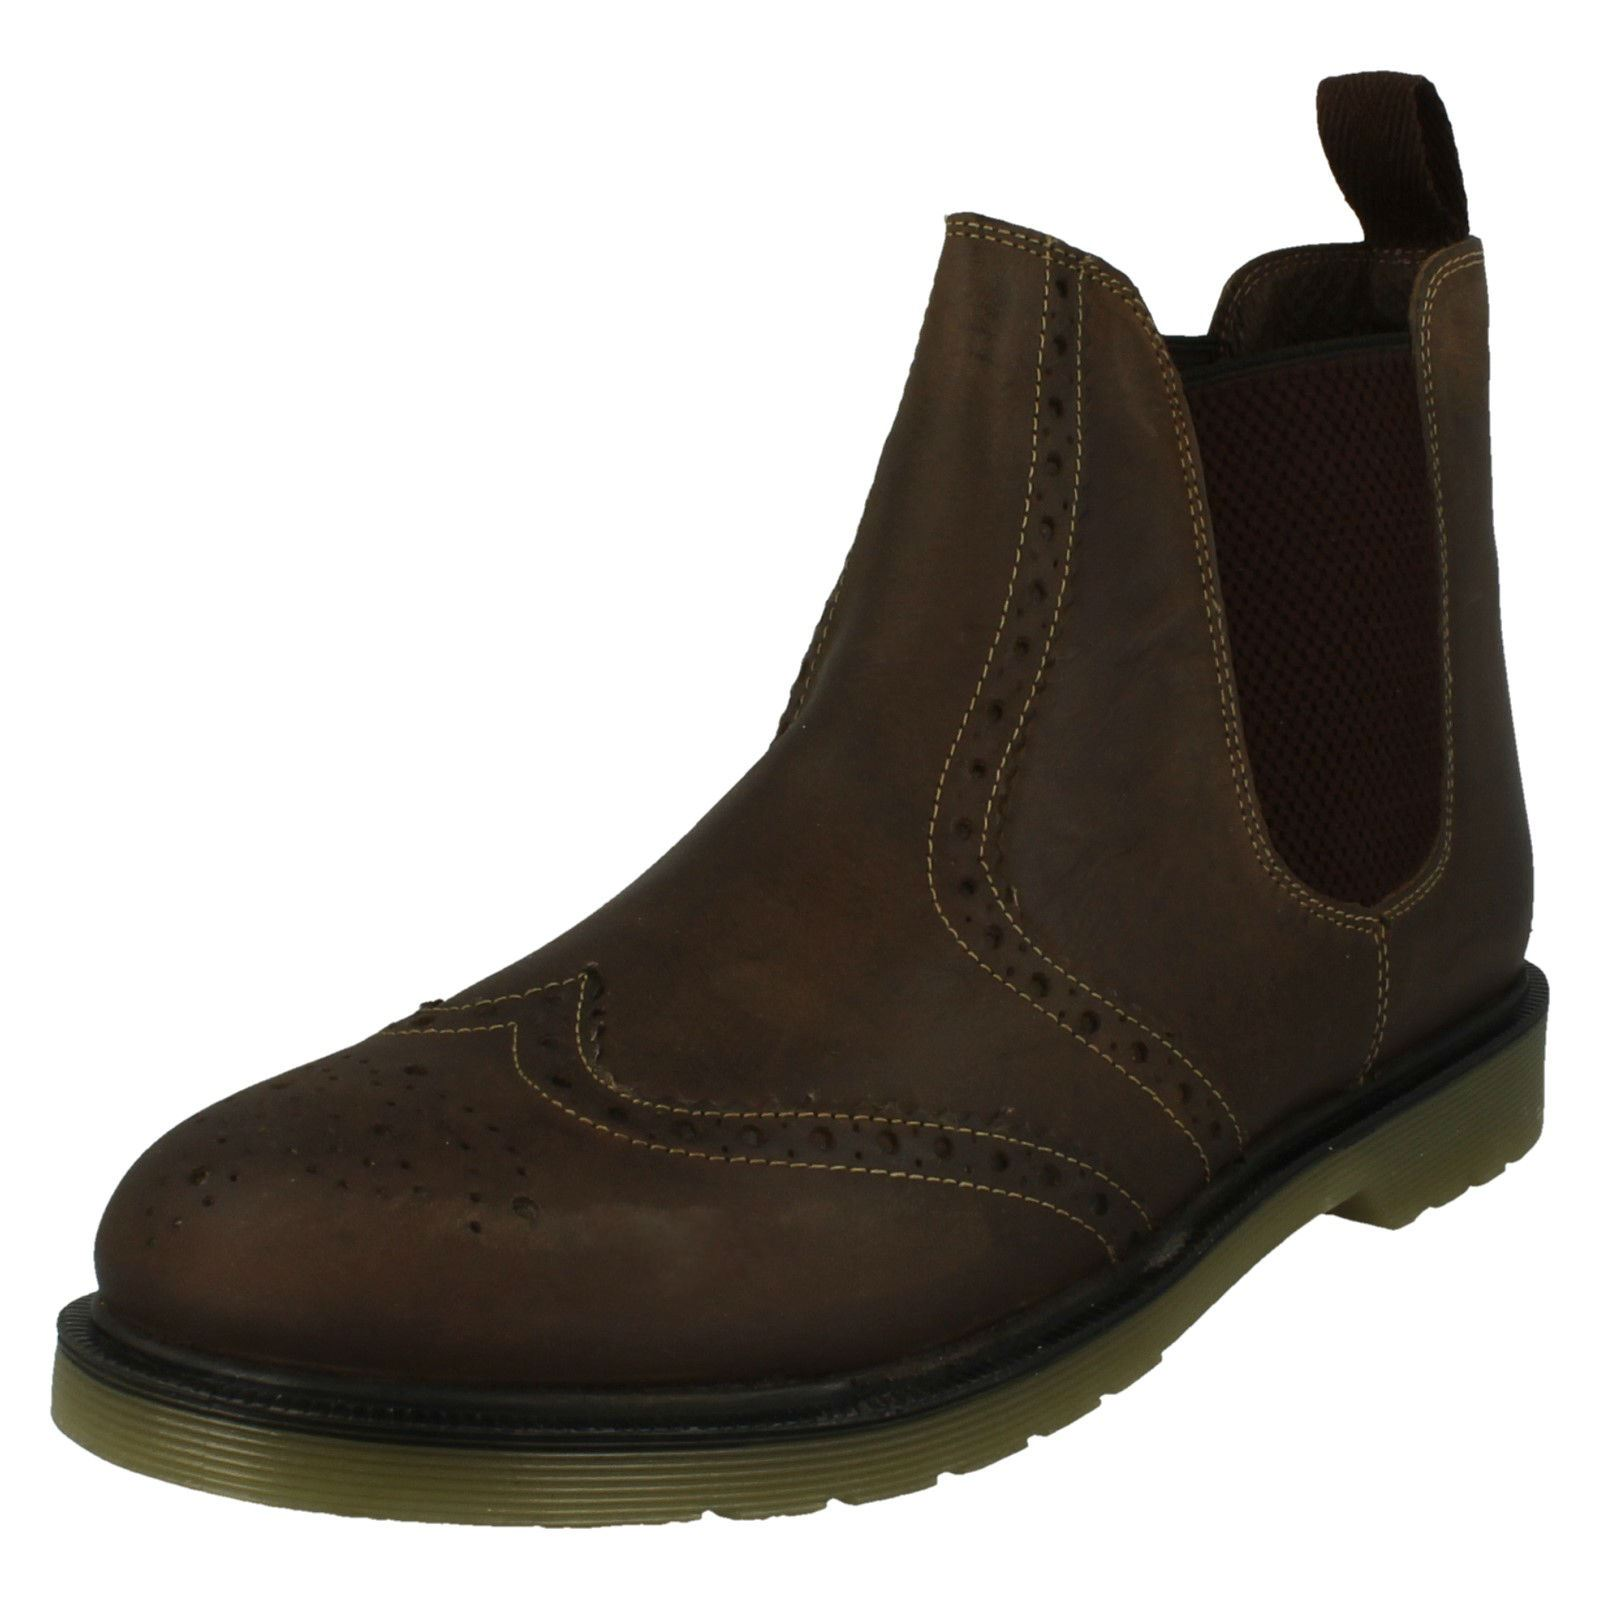 Mens Oak Trak Pull On Chelsea Boots Belper